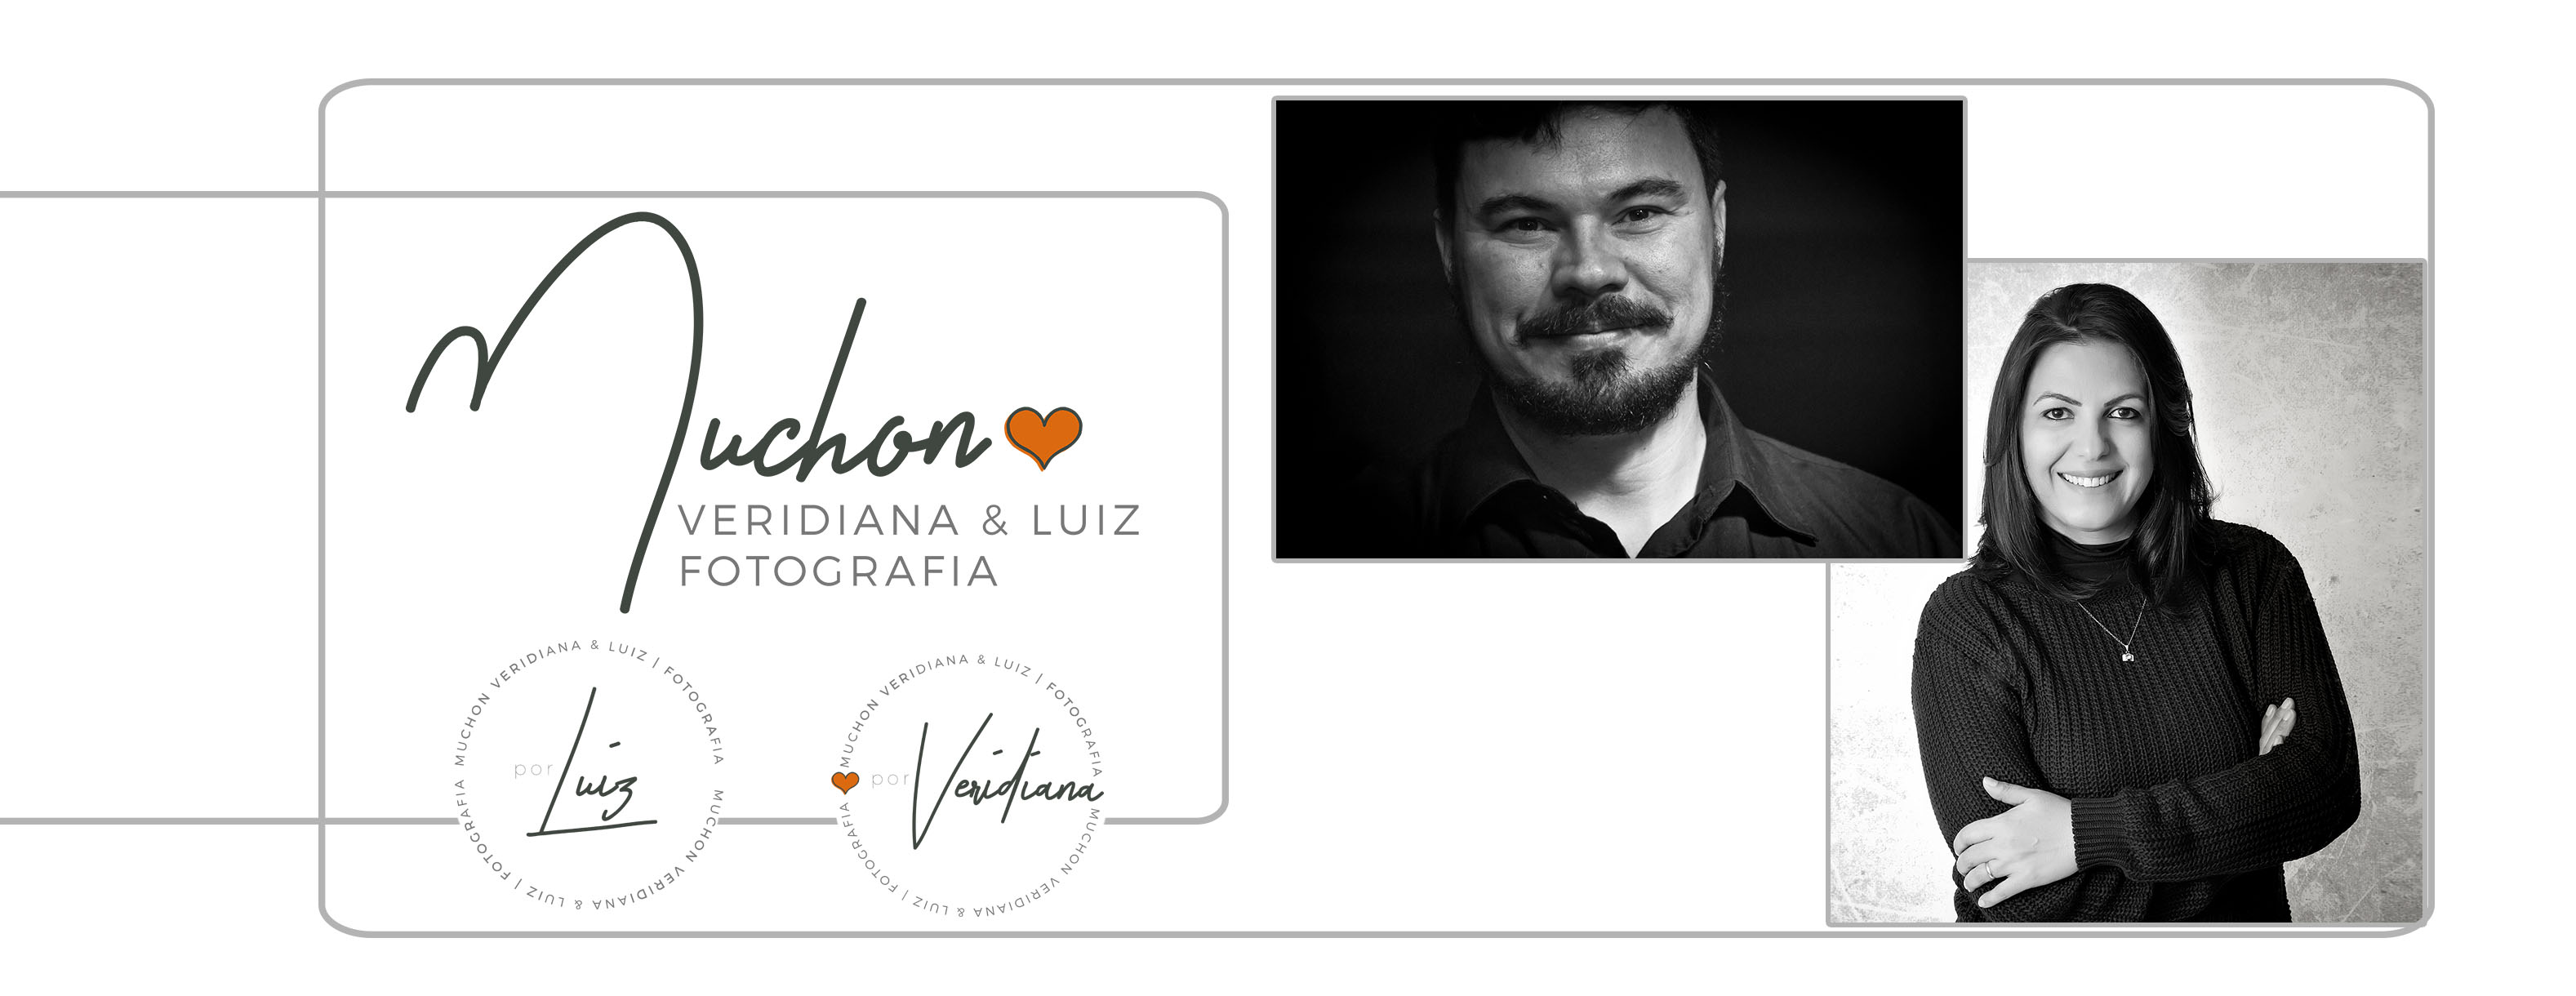 Sobre Muchon Fotografia - Veridiana e Luiz